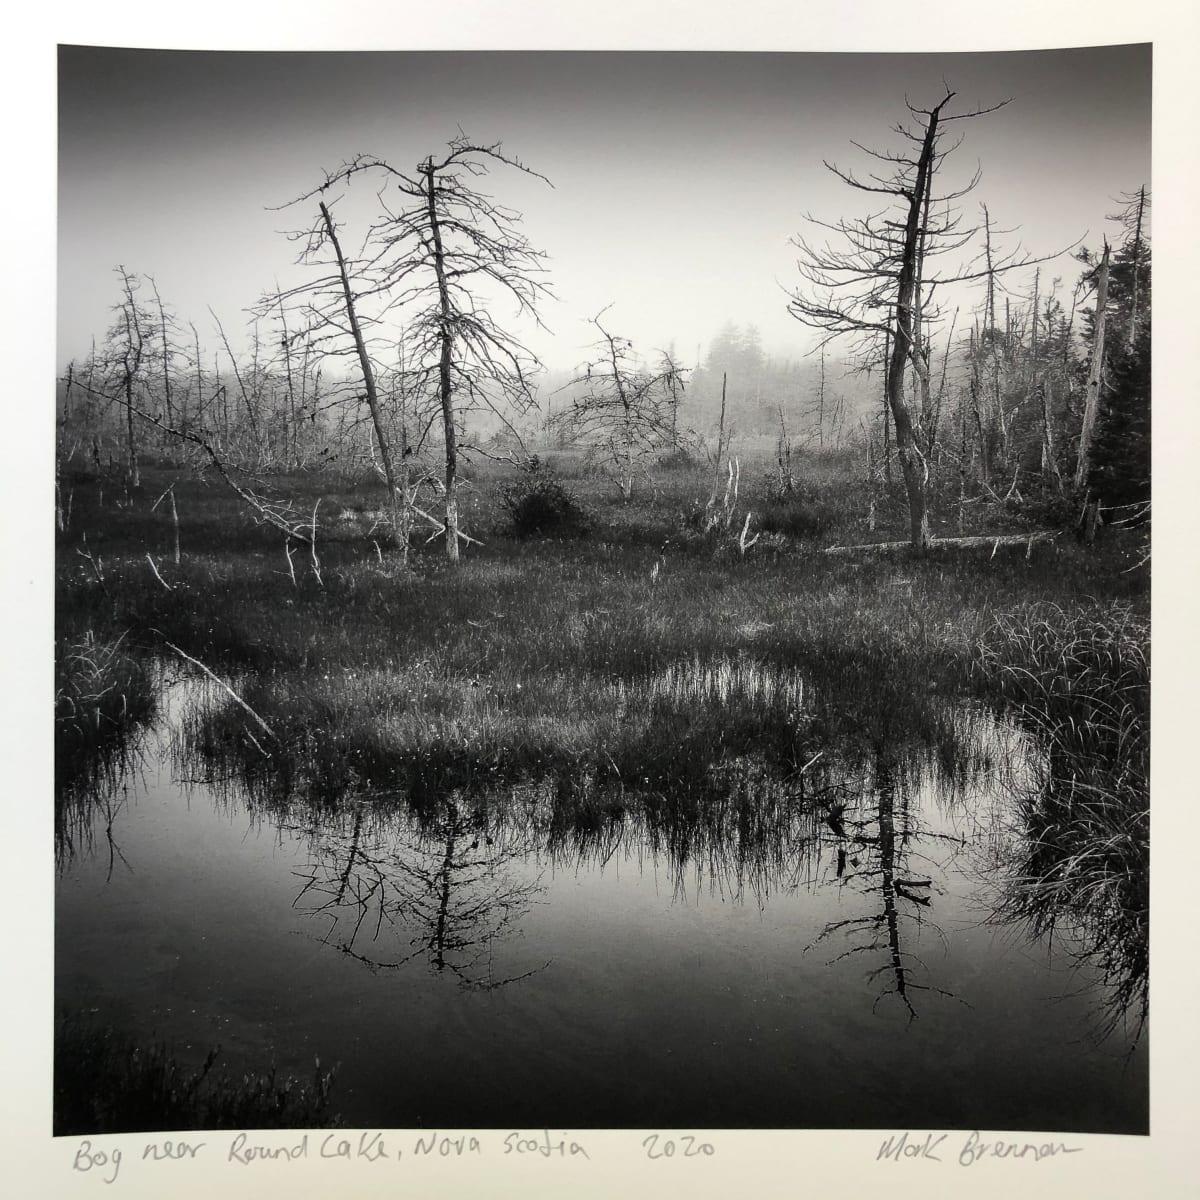 Bog Near Round Lake, Nova Scotia by Mark Brennan